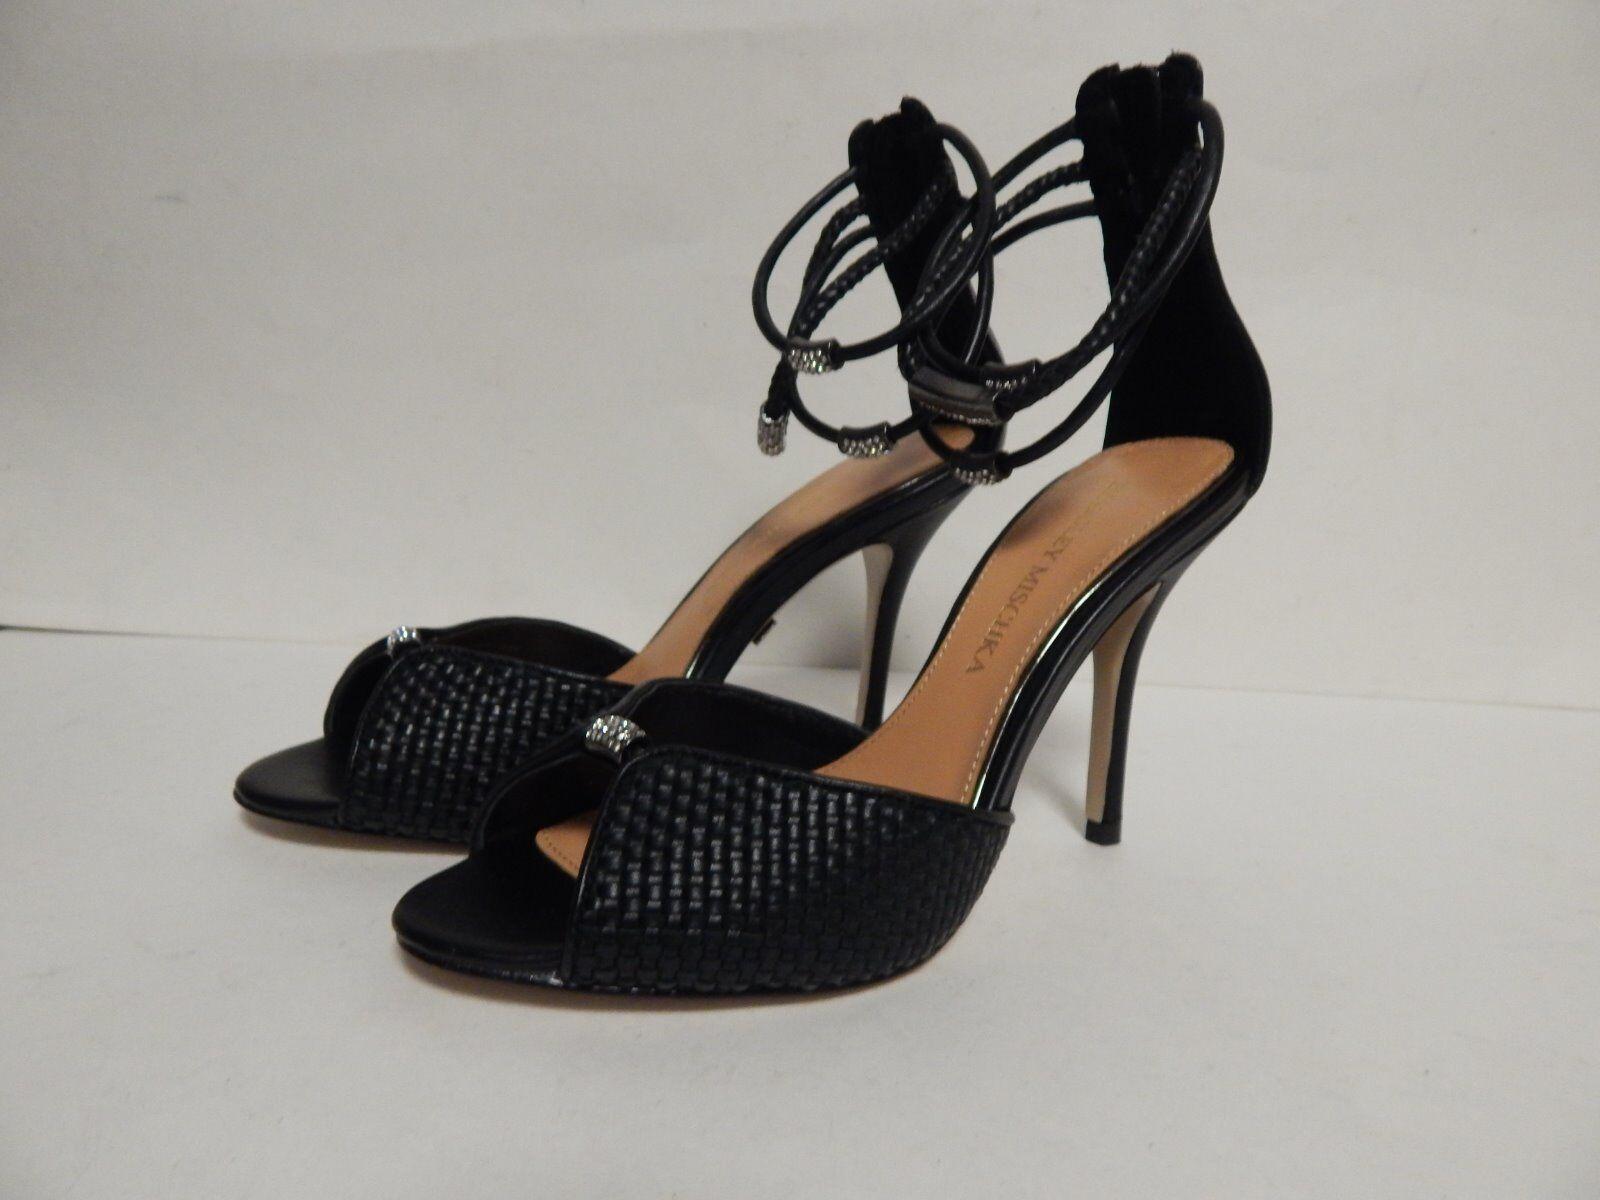 Badgley  Mischka Kandyce Open Toe Sandal 6 6.5 MISMATE New w Defect Floor Sample